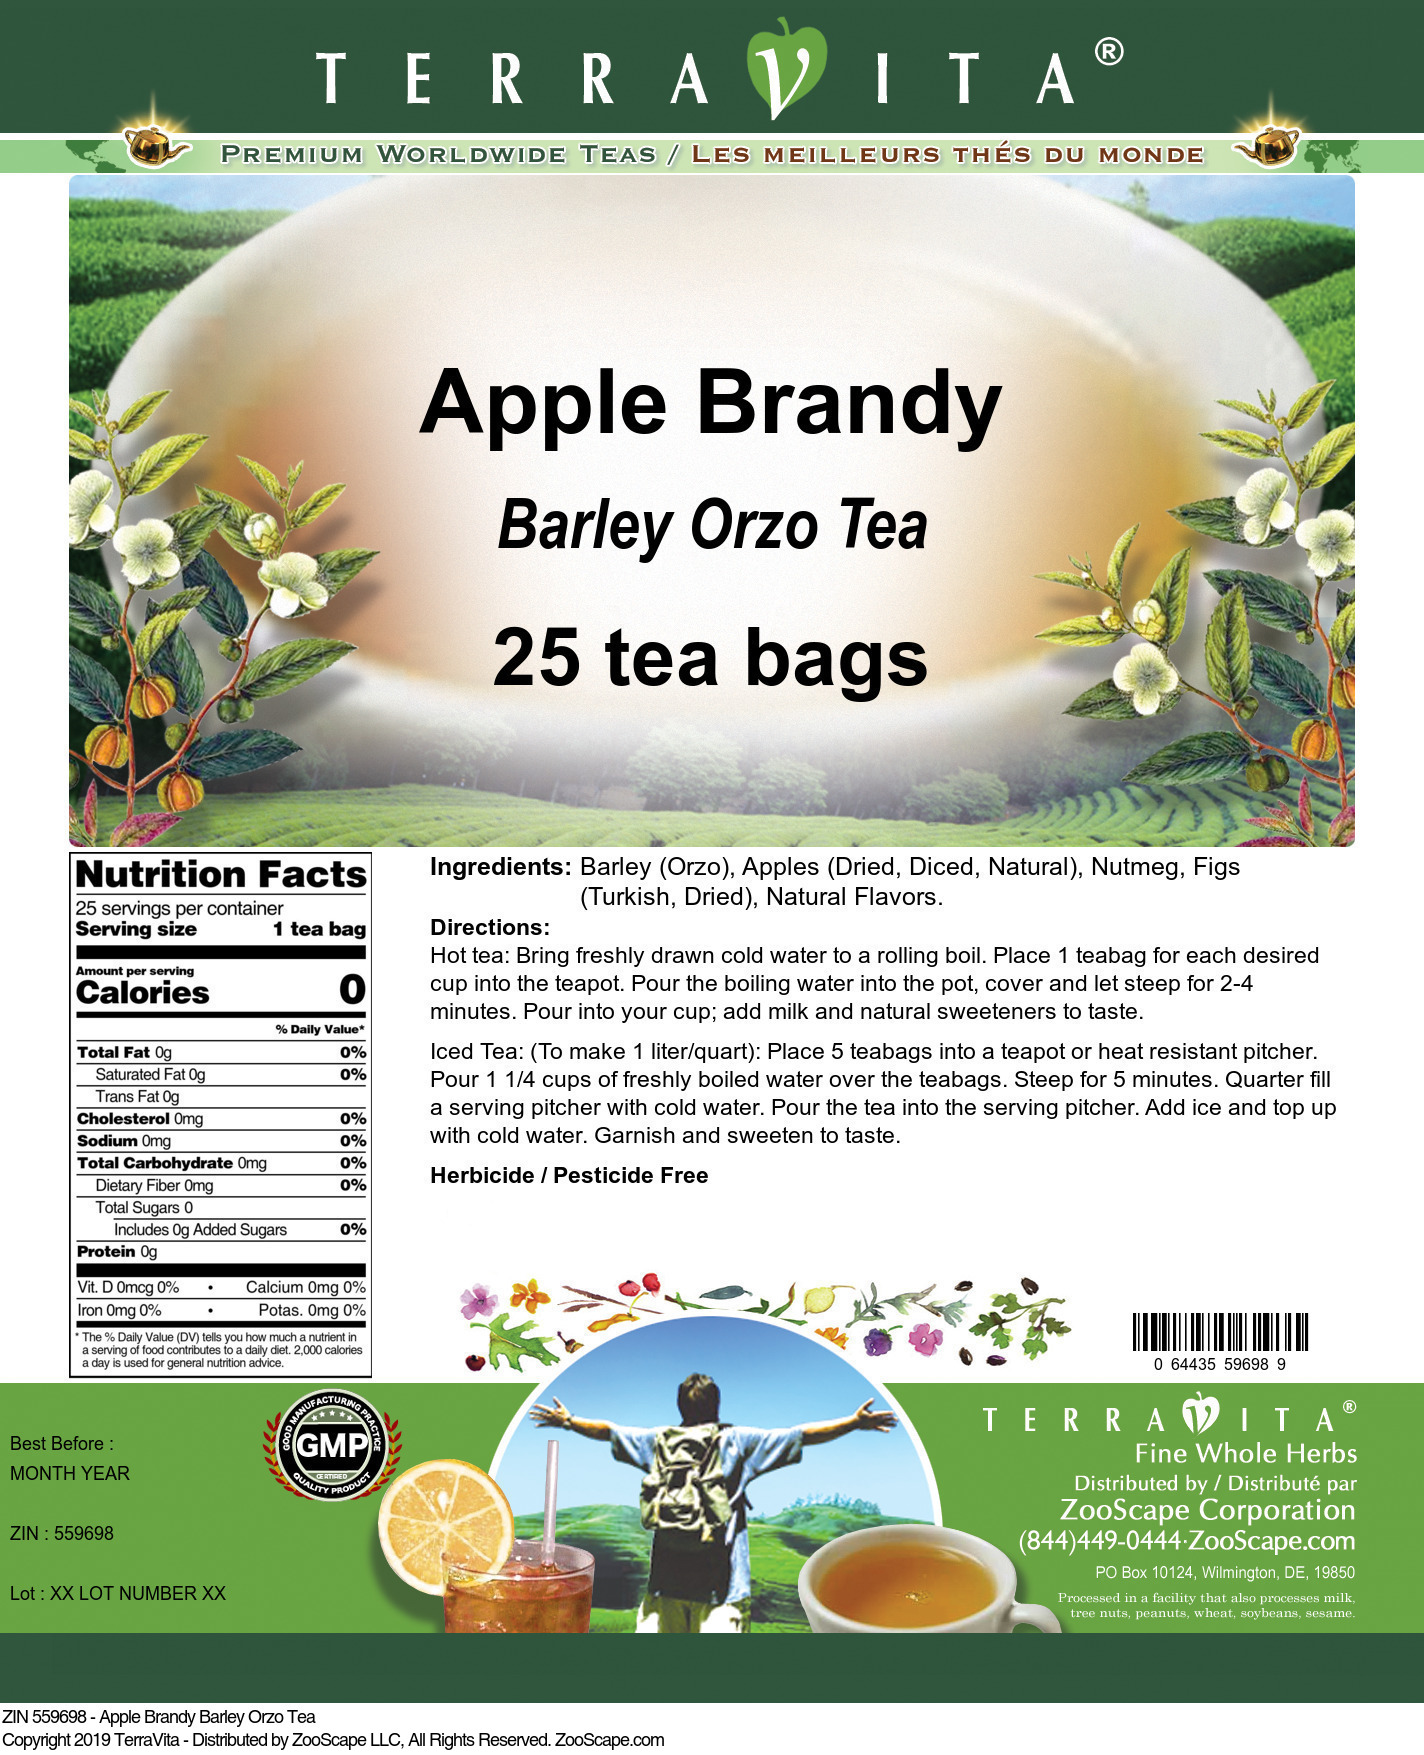 Apple Brandy Barley Orzo